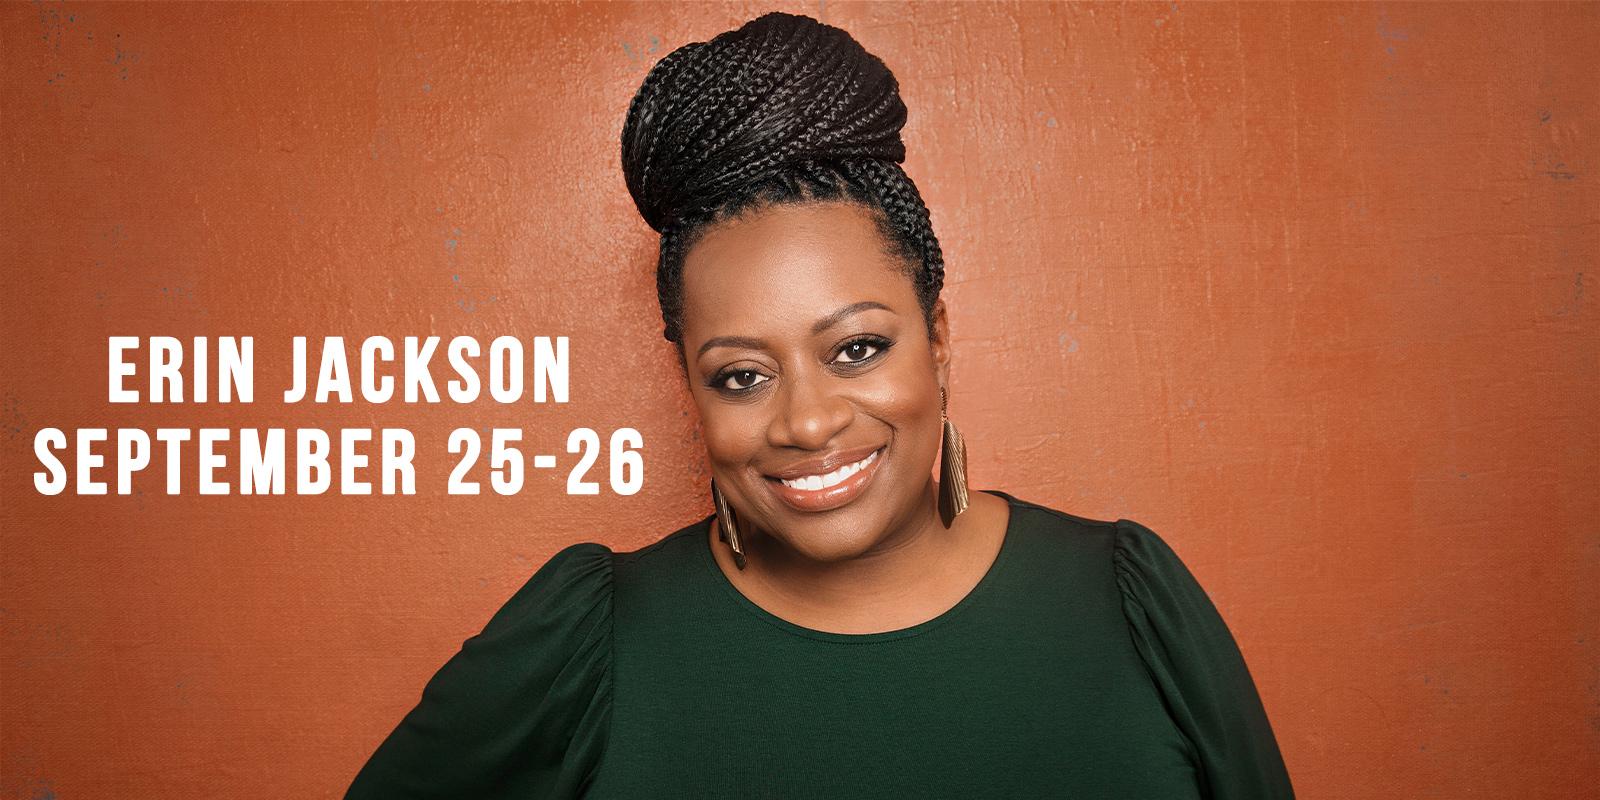 Erin Jackson: Patio Series @ Callback Stage